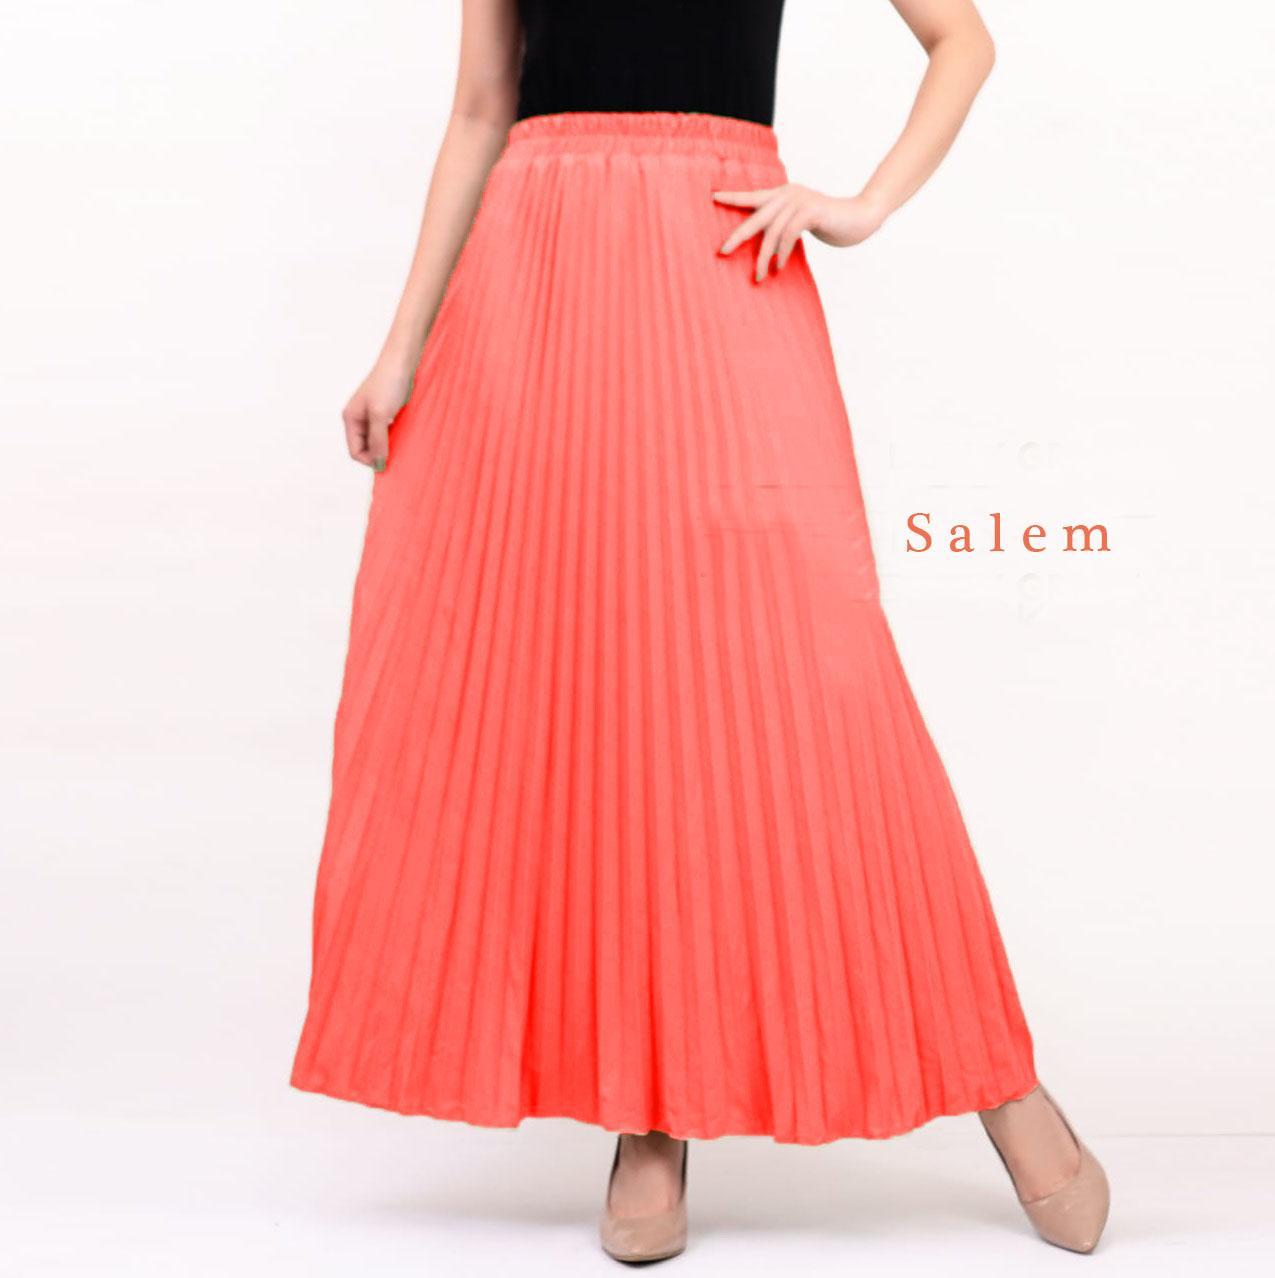 ebe0e28fd20aba Ciara Fashion Rok Payung Plisket   Maxi skirt   Bahan Import   Bawahan   Rok  maxi